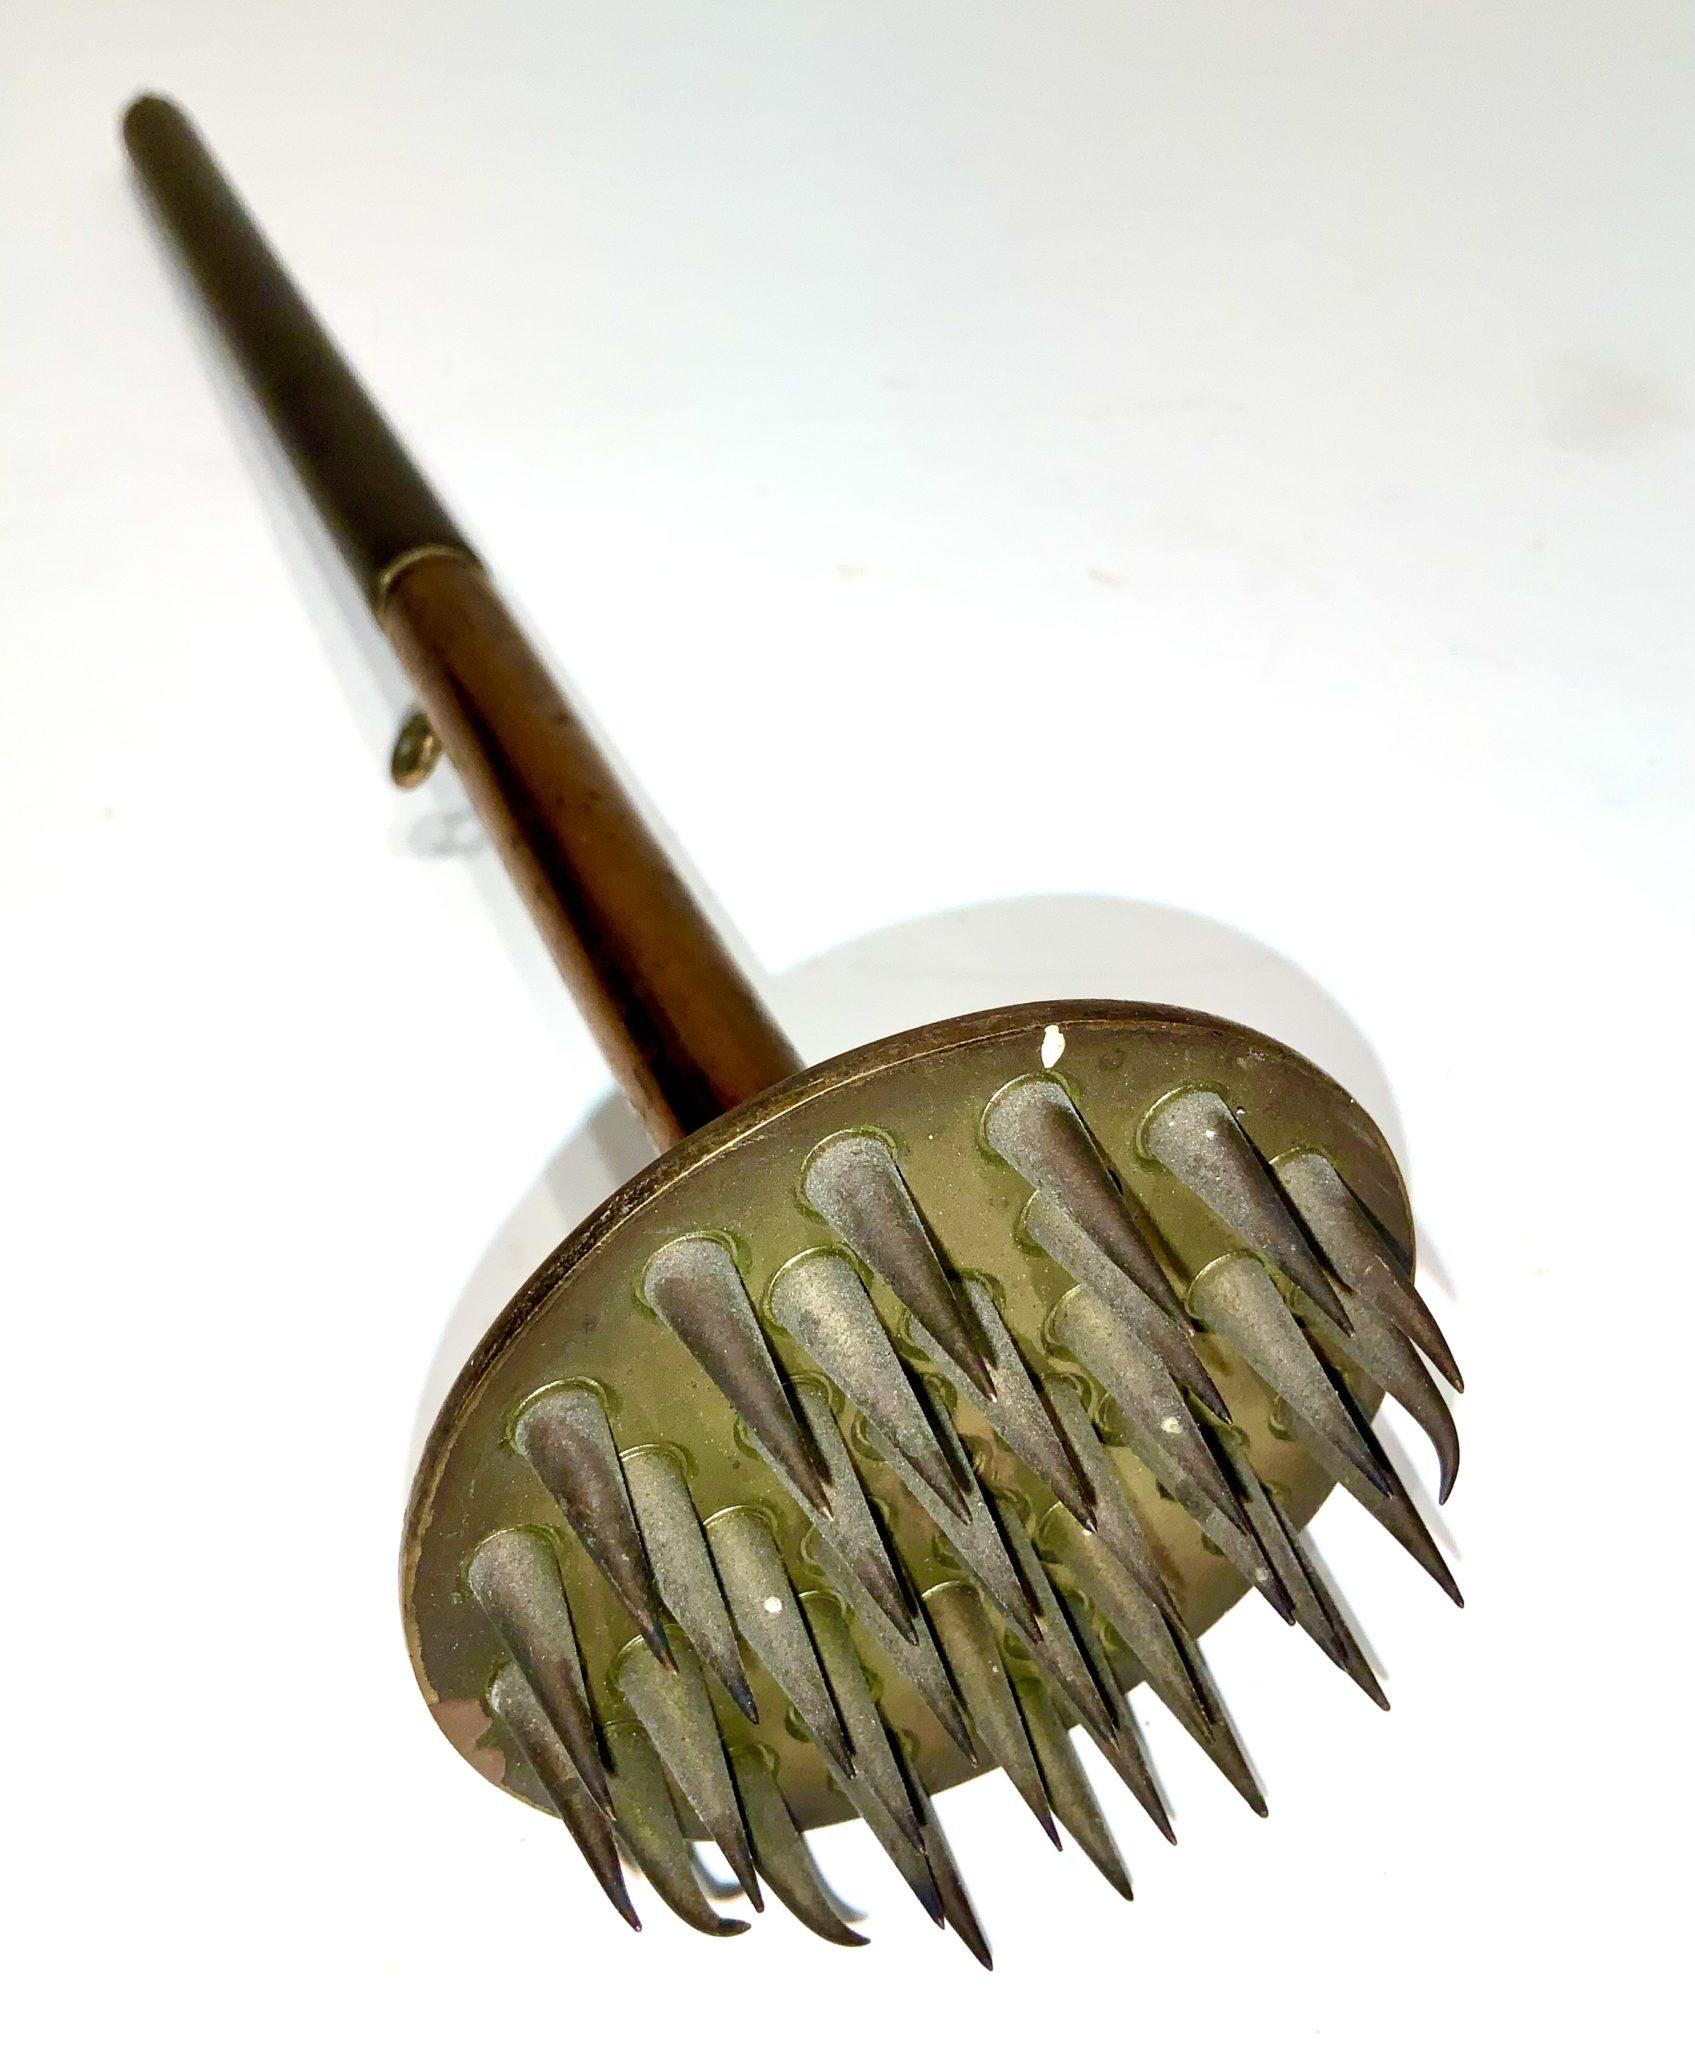 Electro Medicinal Handheld Electrode Device – Circa 1870 – Brass and Wood